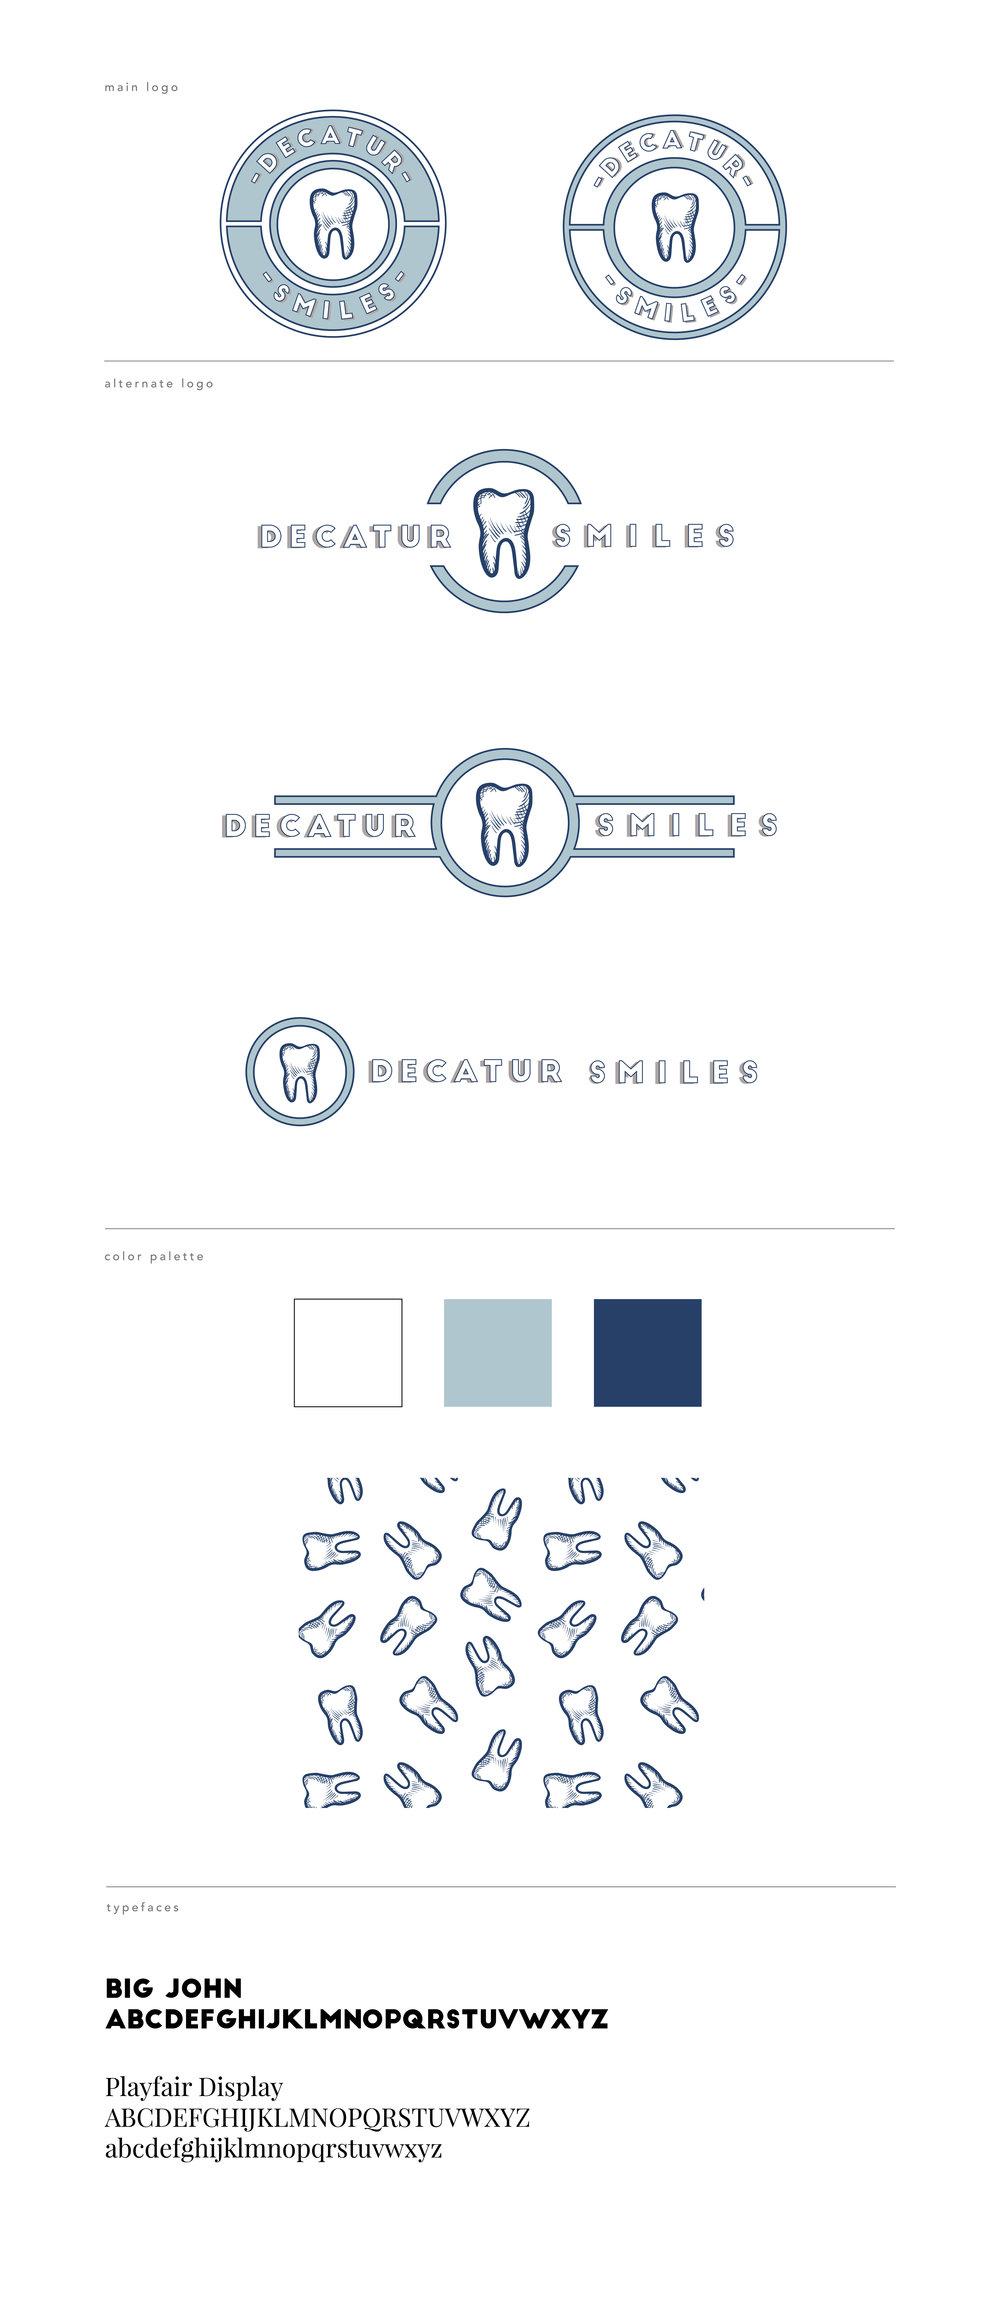 Decatur Smiles_final logo_smaller-02.jpg